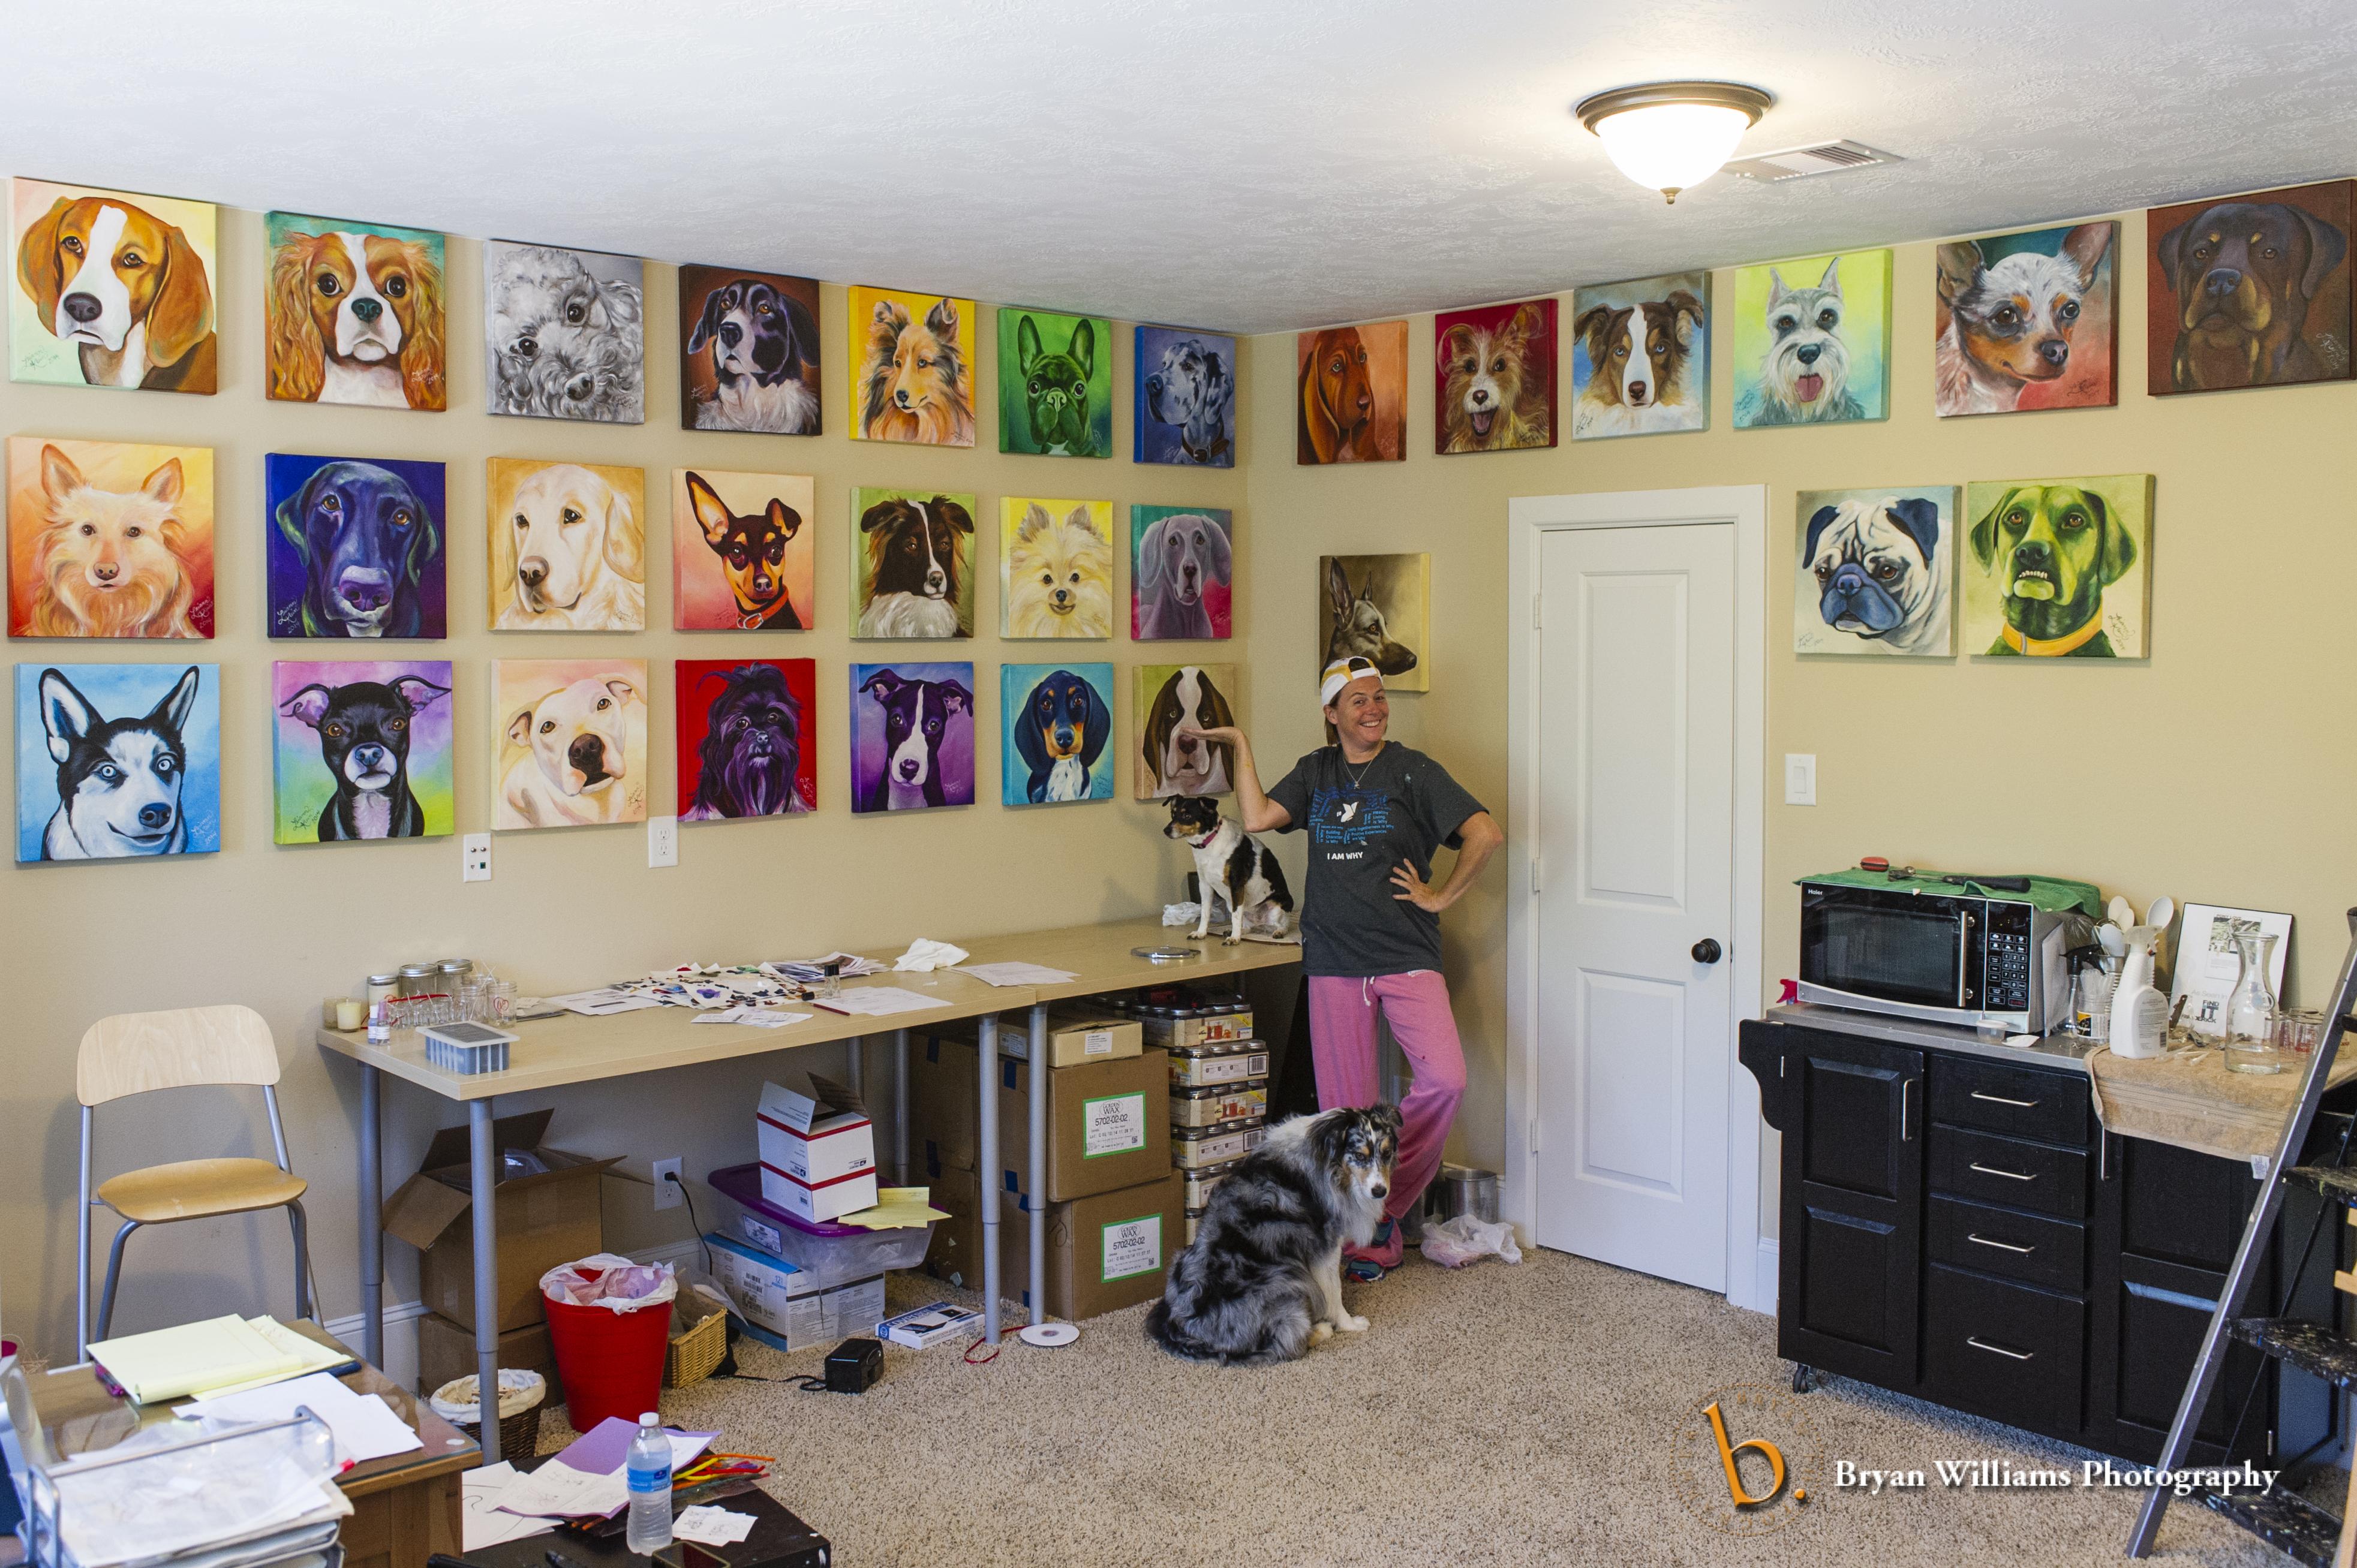 Leiann Klein with 30 Dogs 30 Days